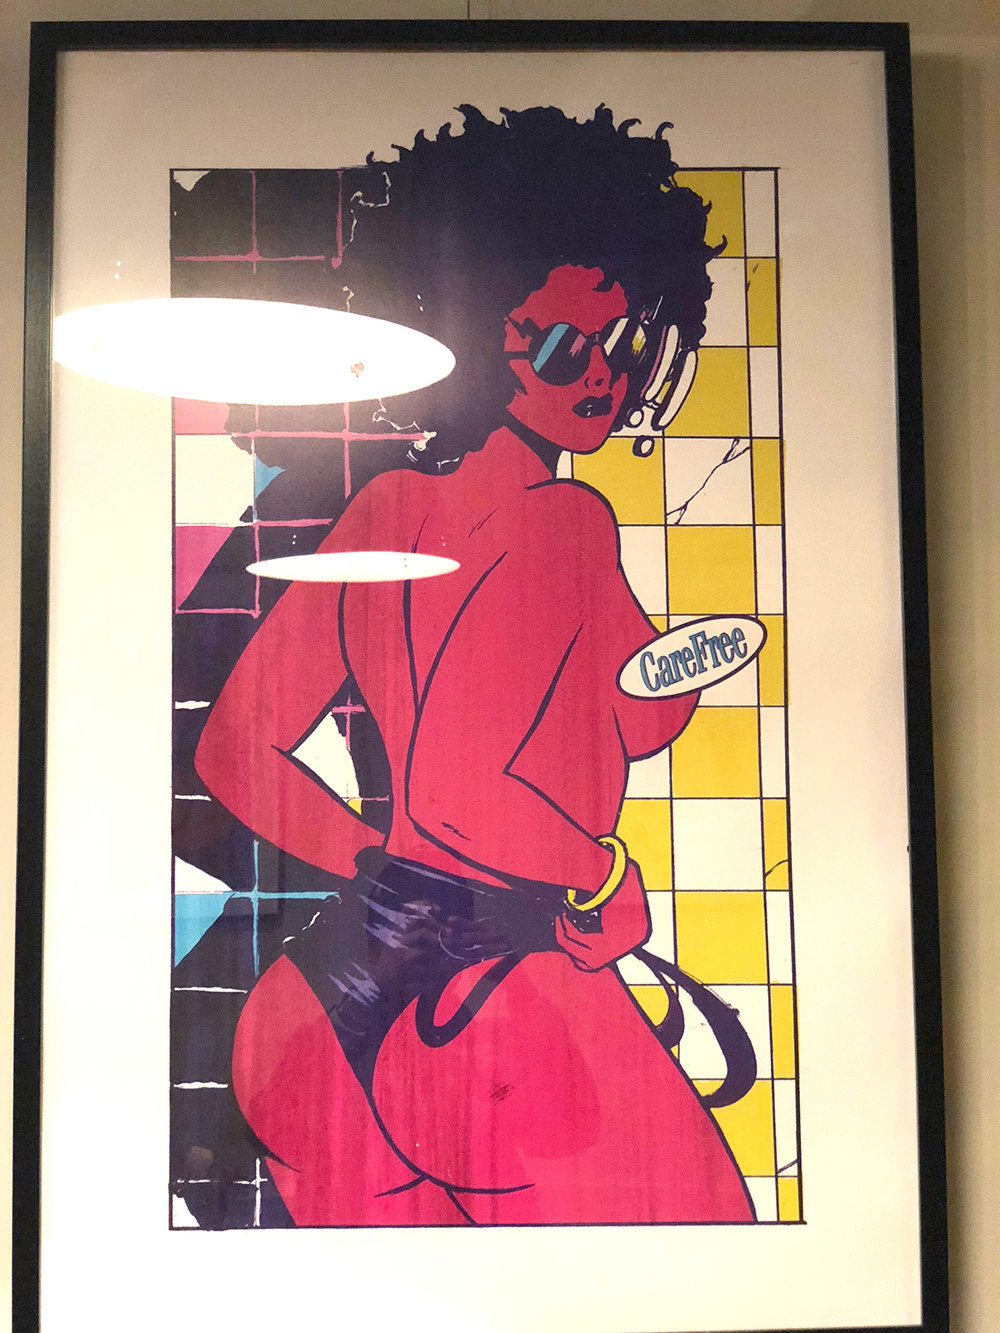 Framed 'Shower Scene' - Selected Print Works Exhibition (London NW10)